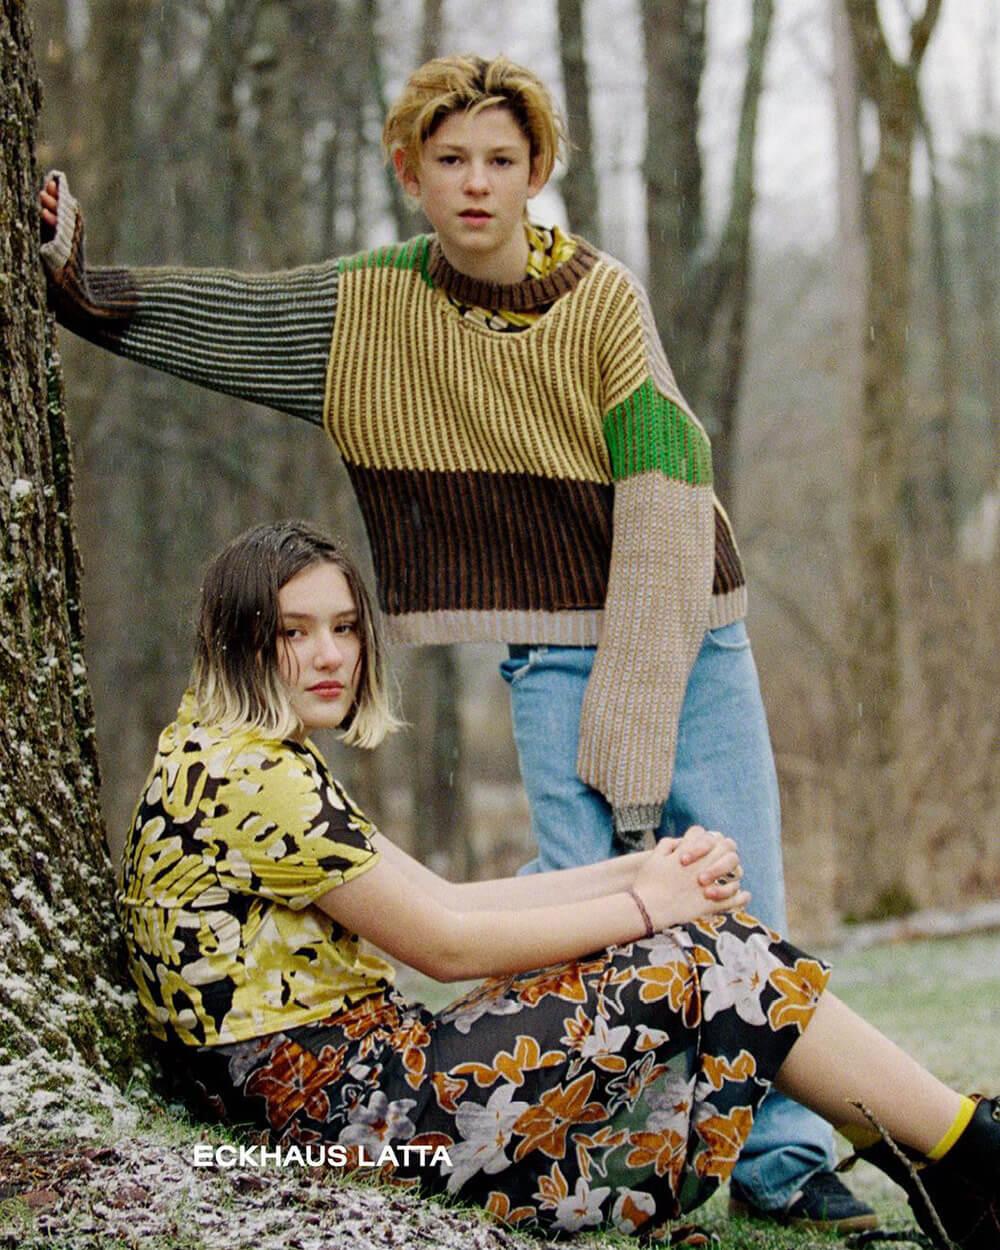 Eckhaus Latta Androgynous clothing